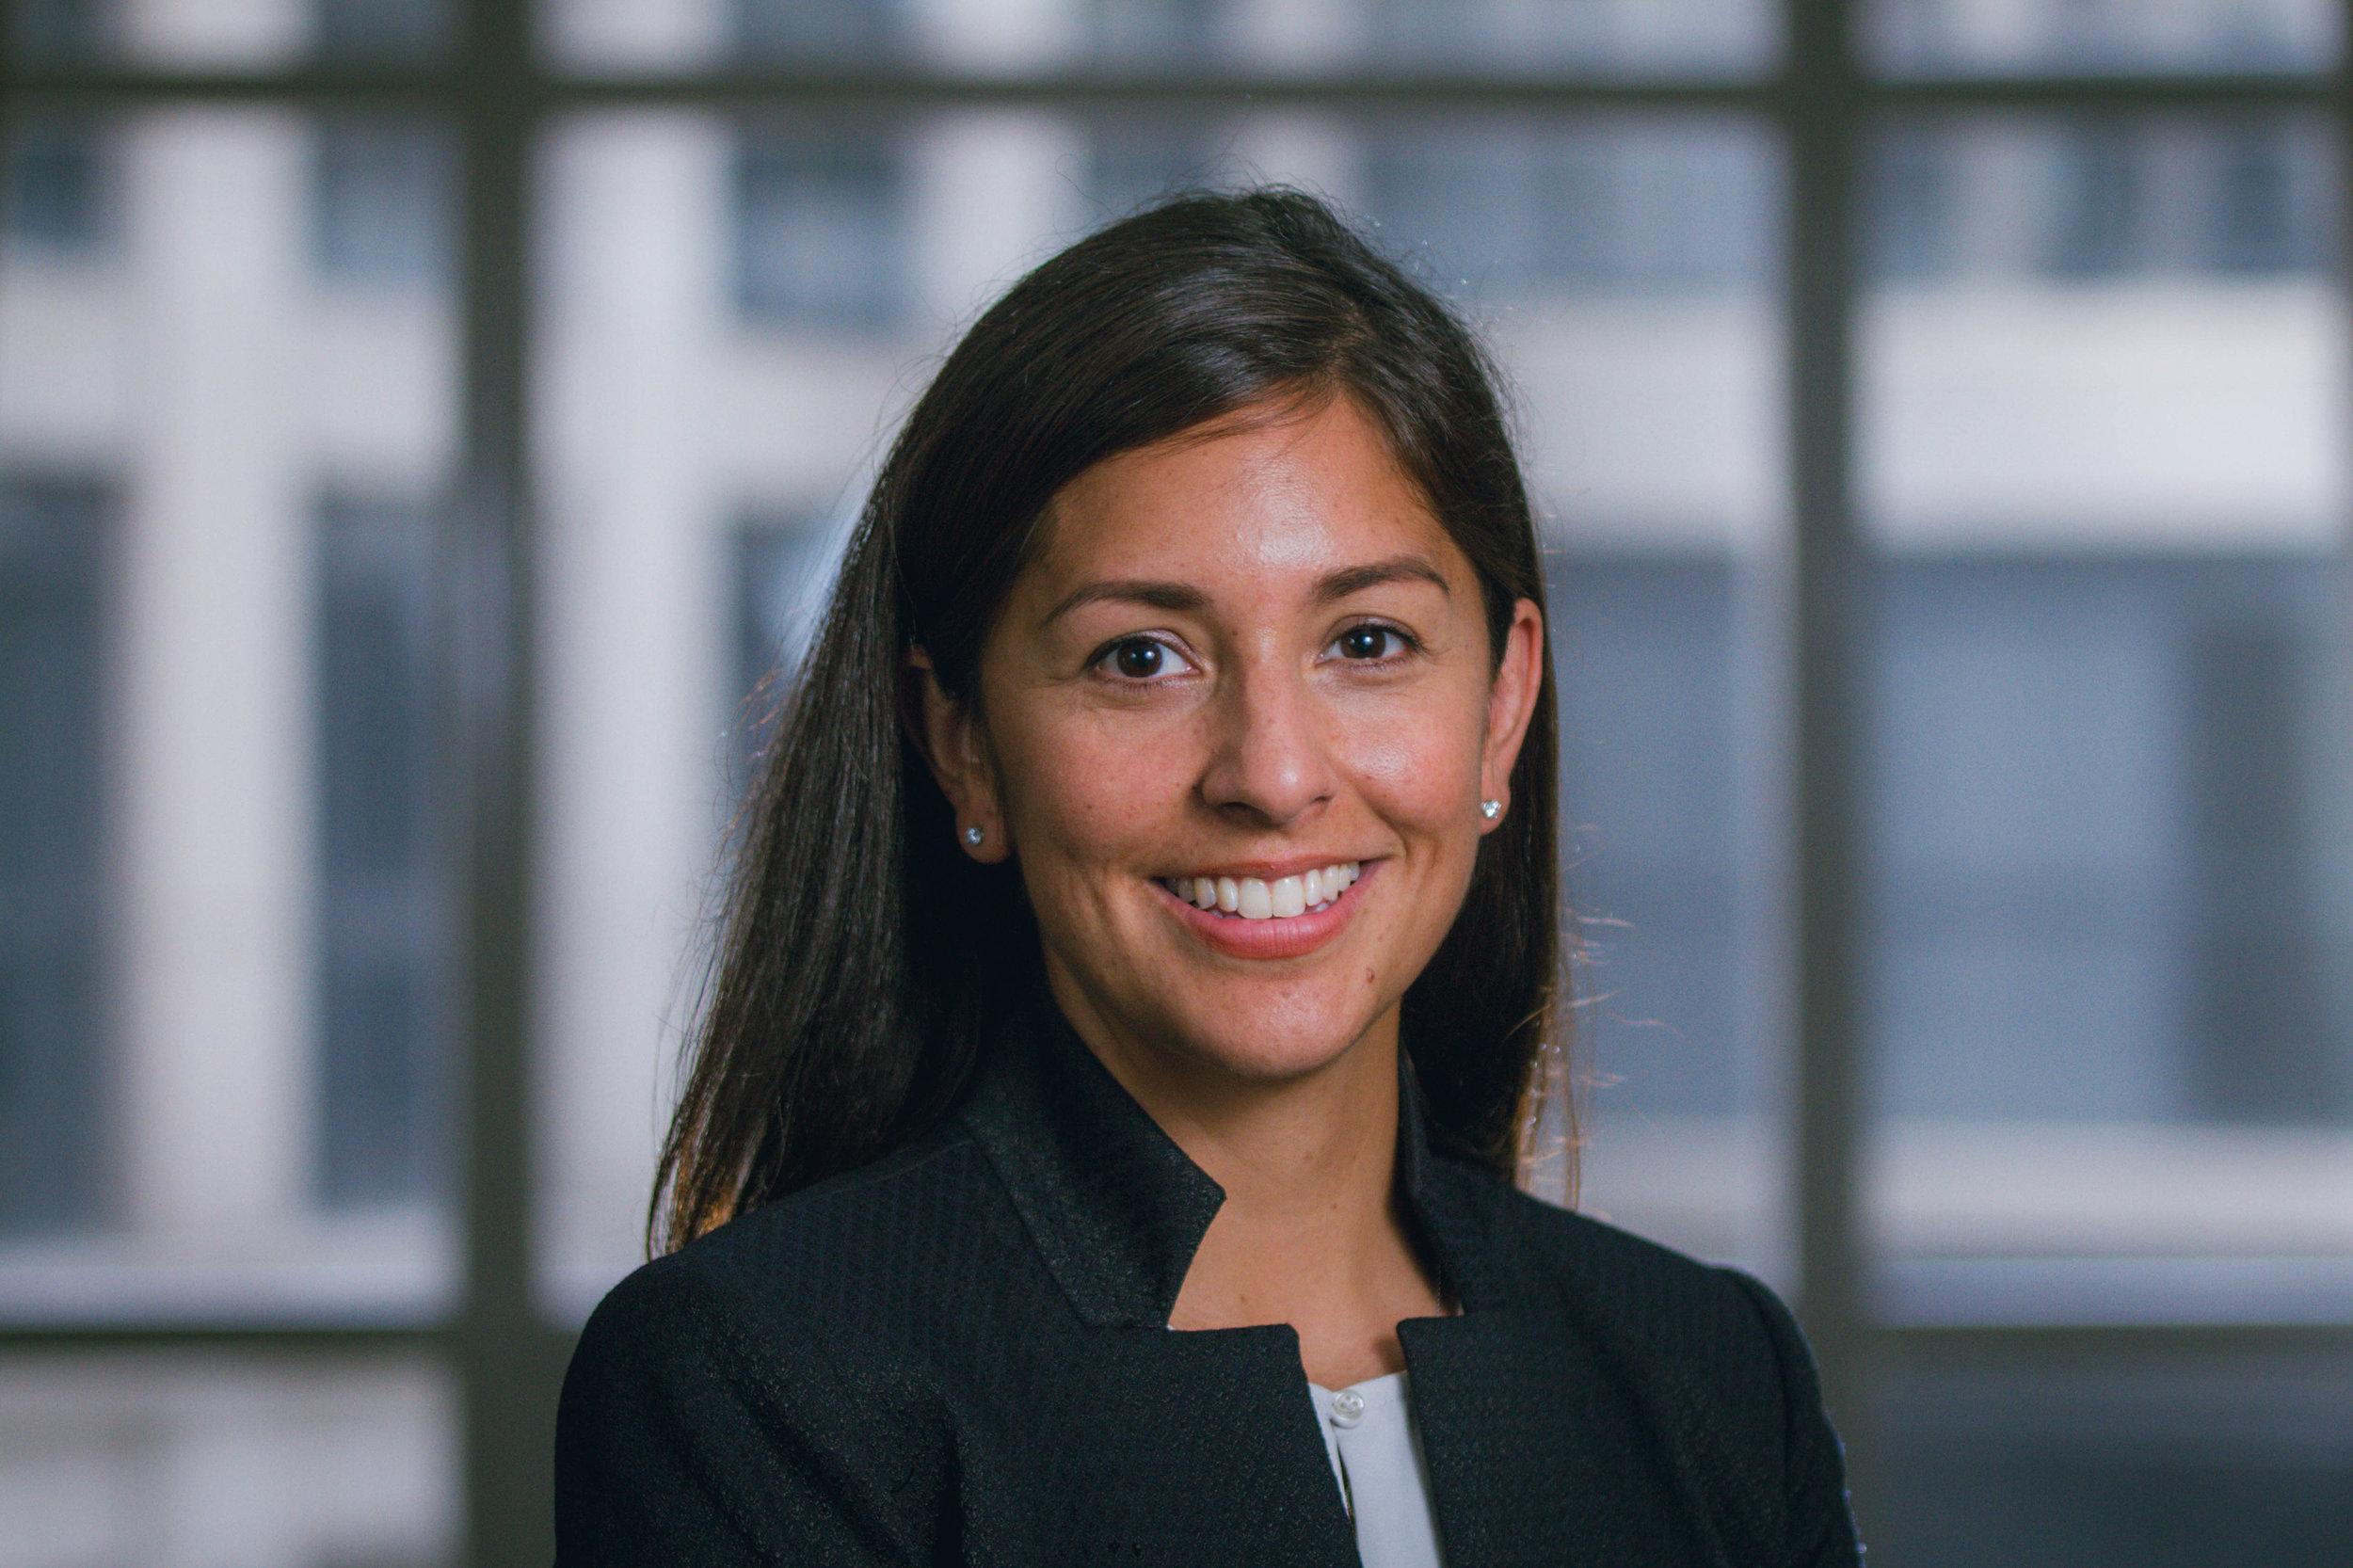 Laura Sanhueza-Miller